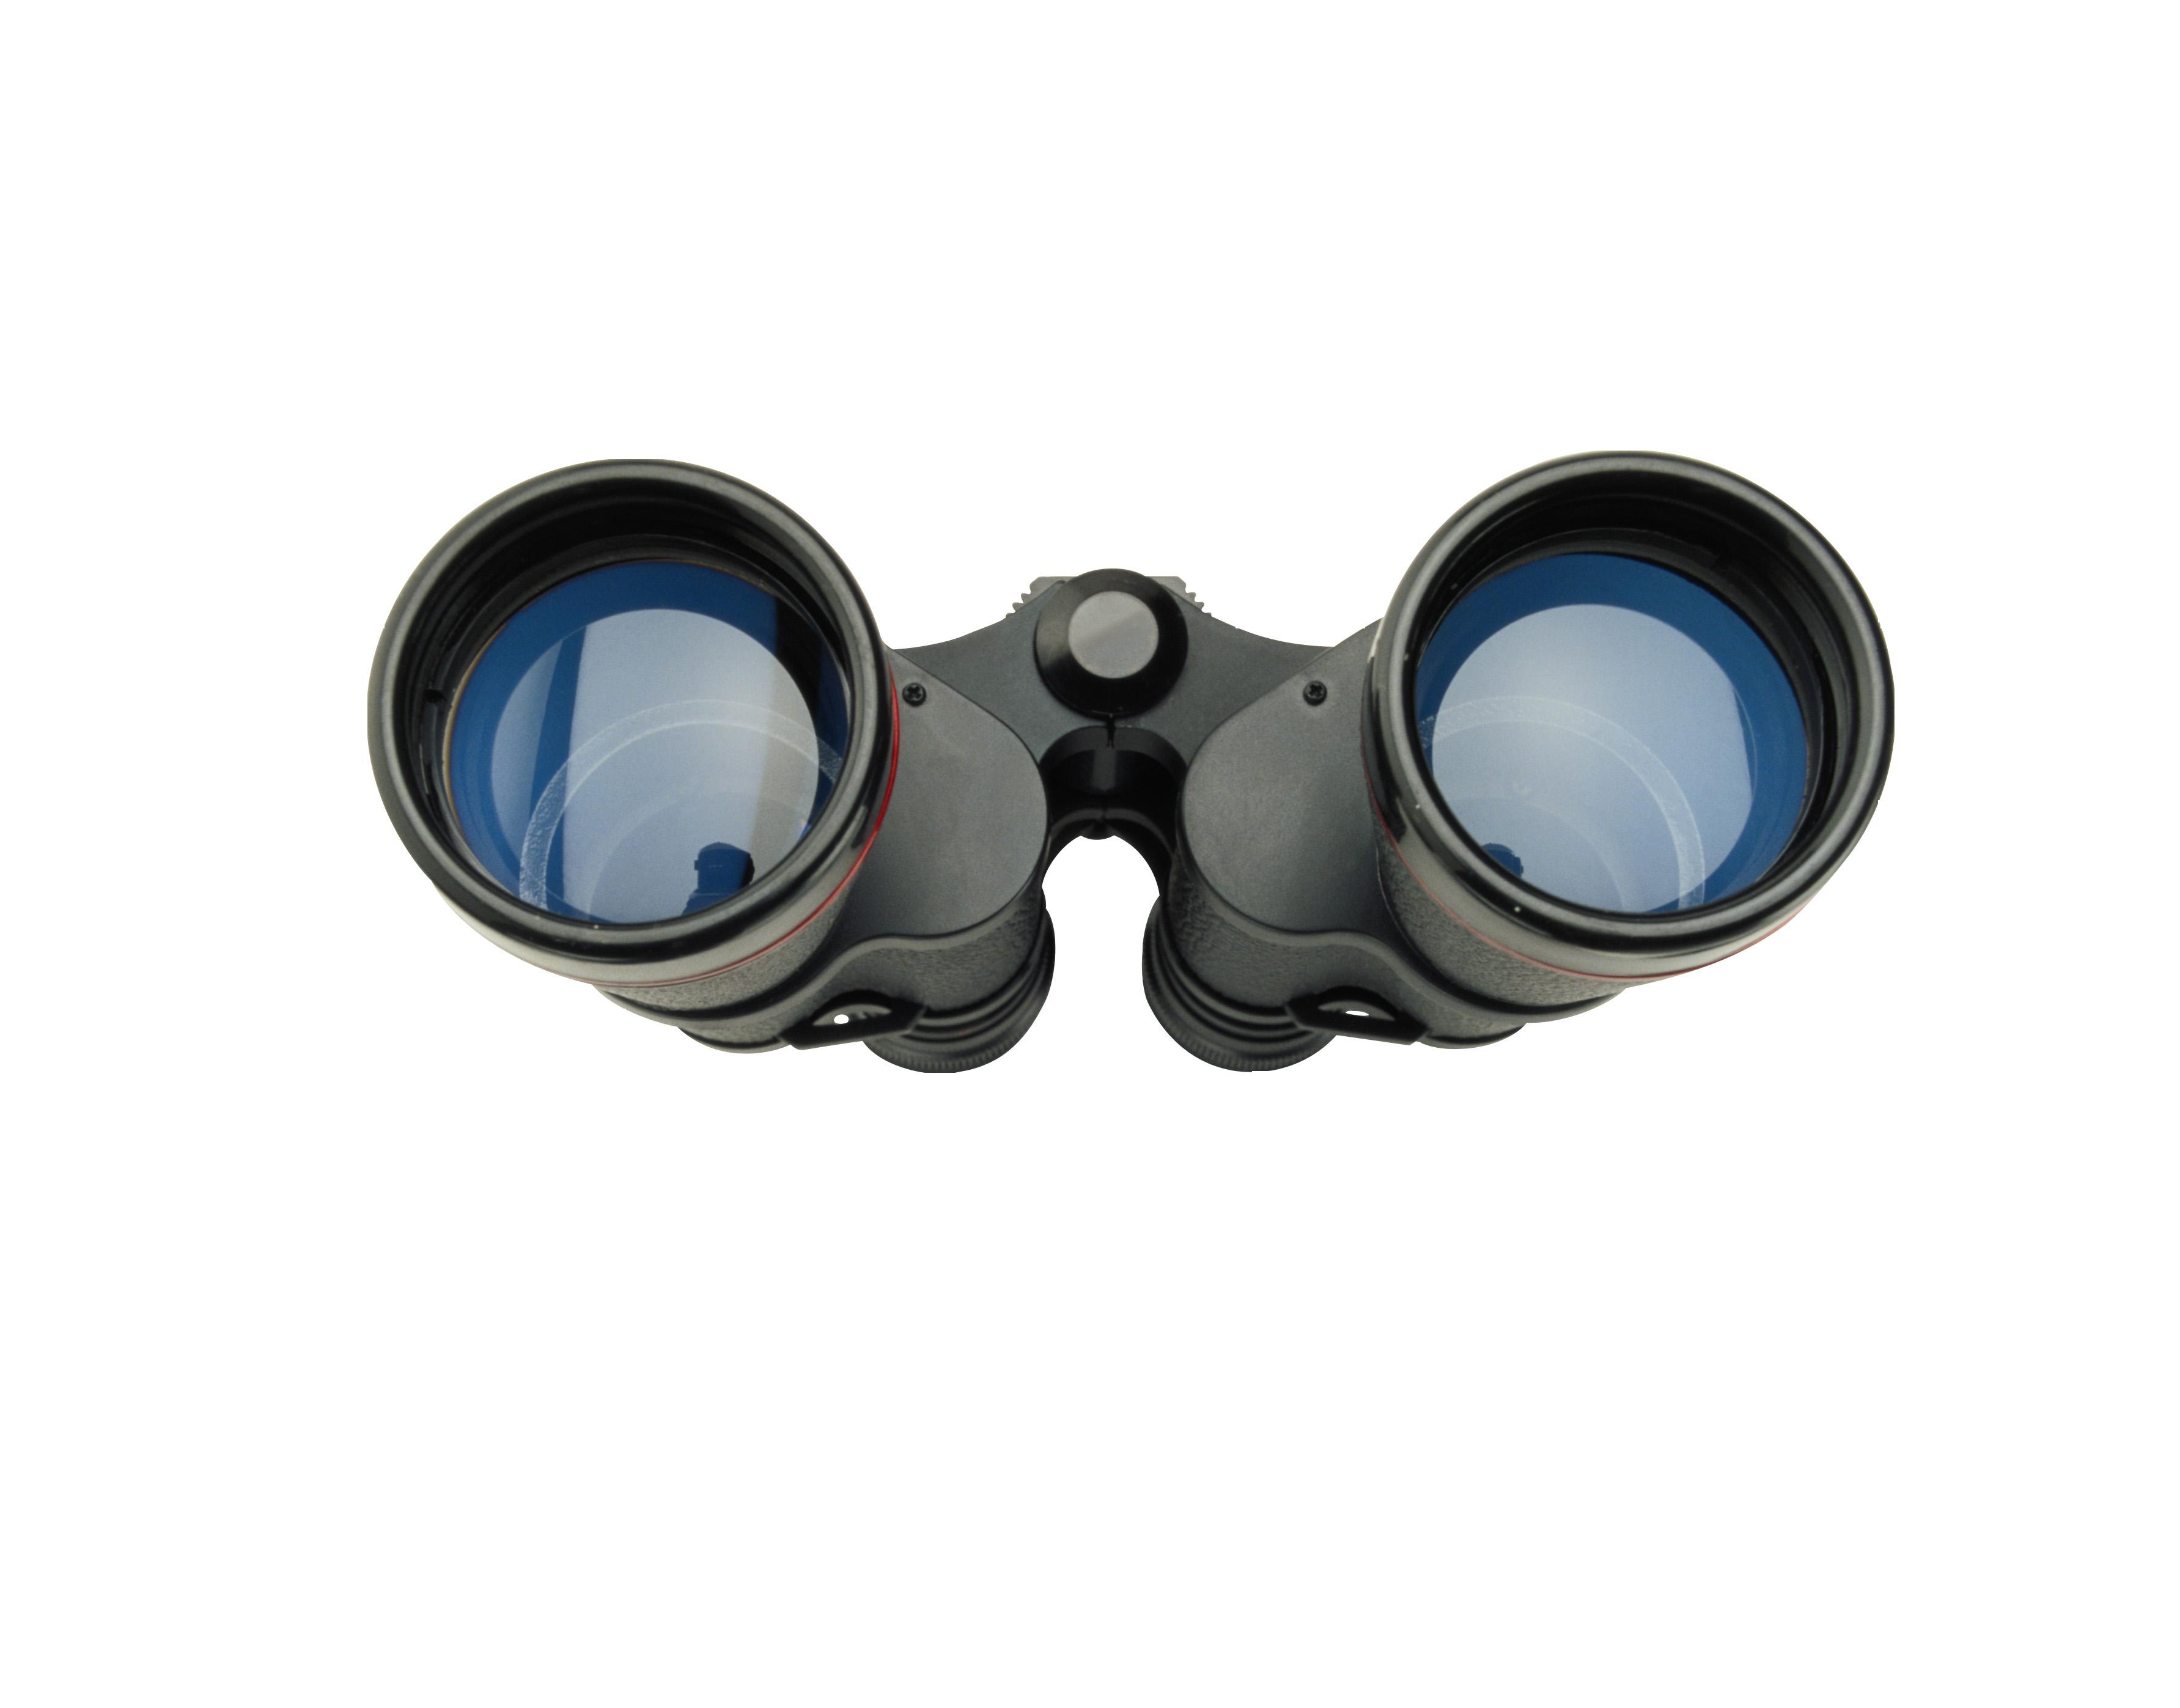 Binocular png images free. Vision clipart binoculars